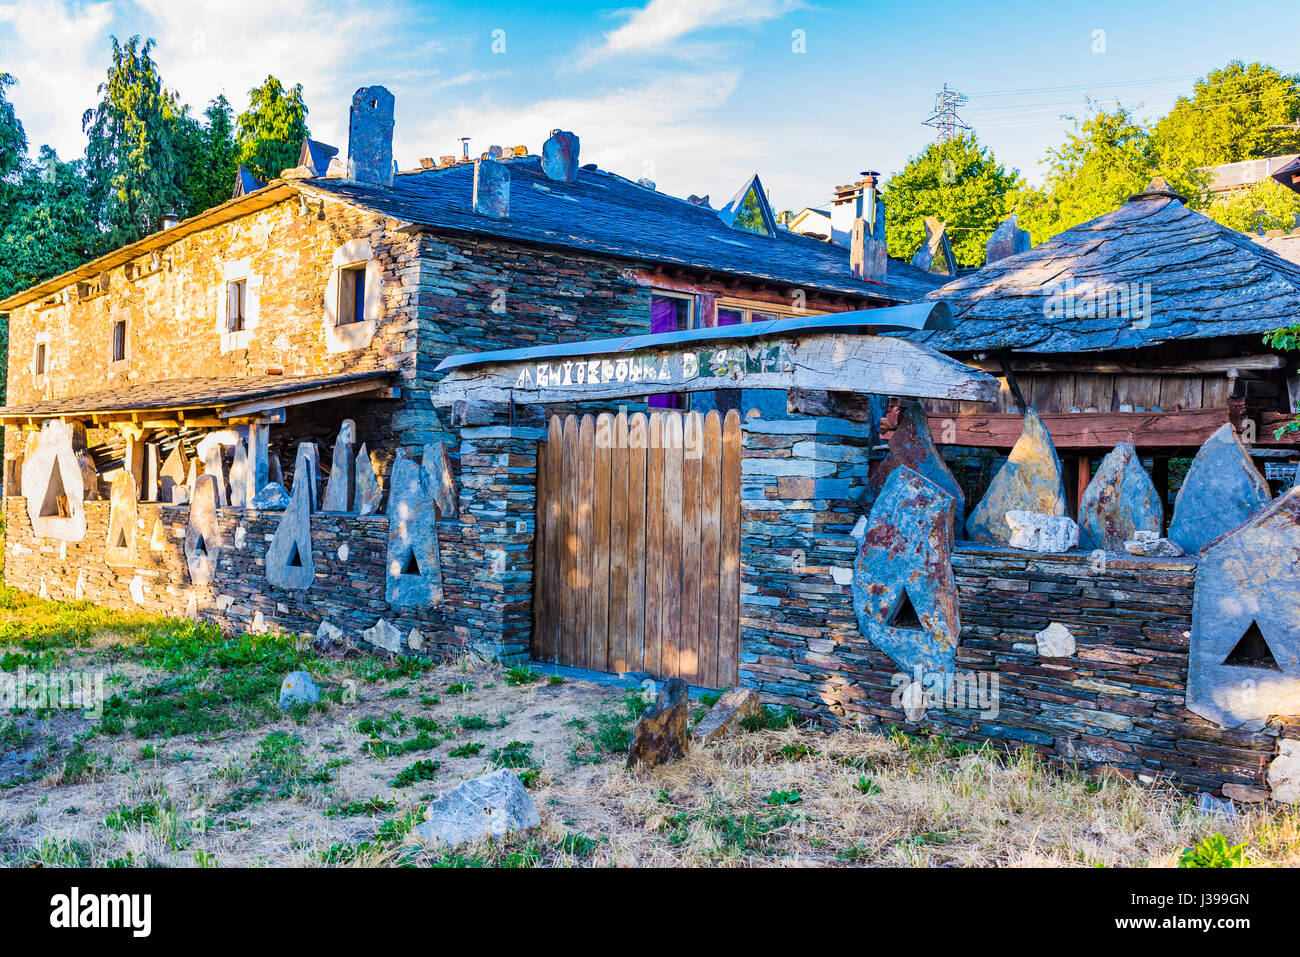 Interpretation Center of Architecture of the zone of the Oscos. Martul, Villanueva de Oscos, Principality of Asturias, - Stock Image